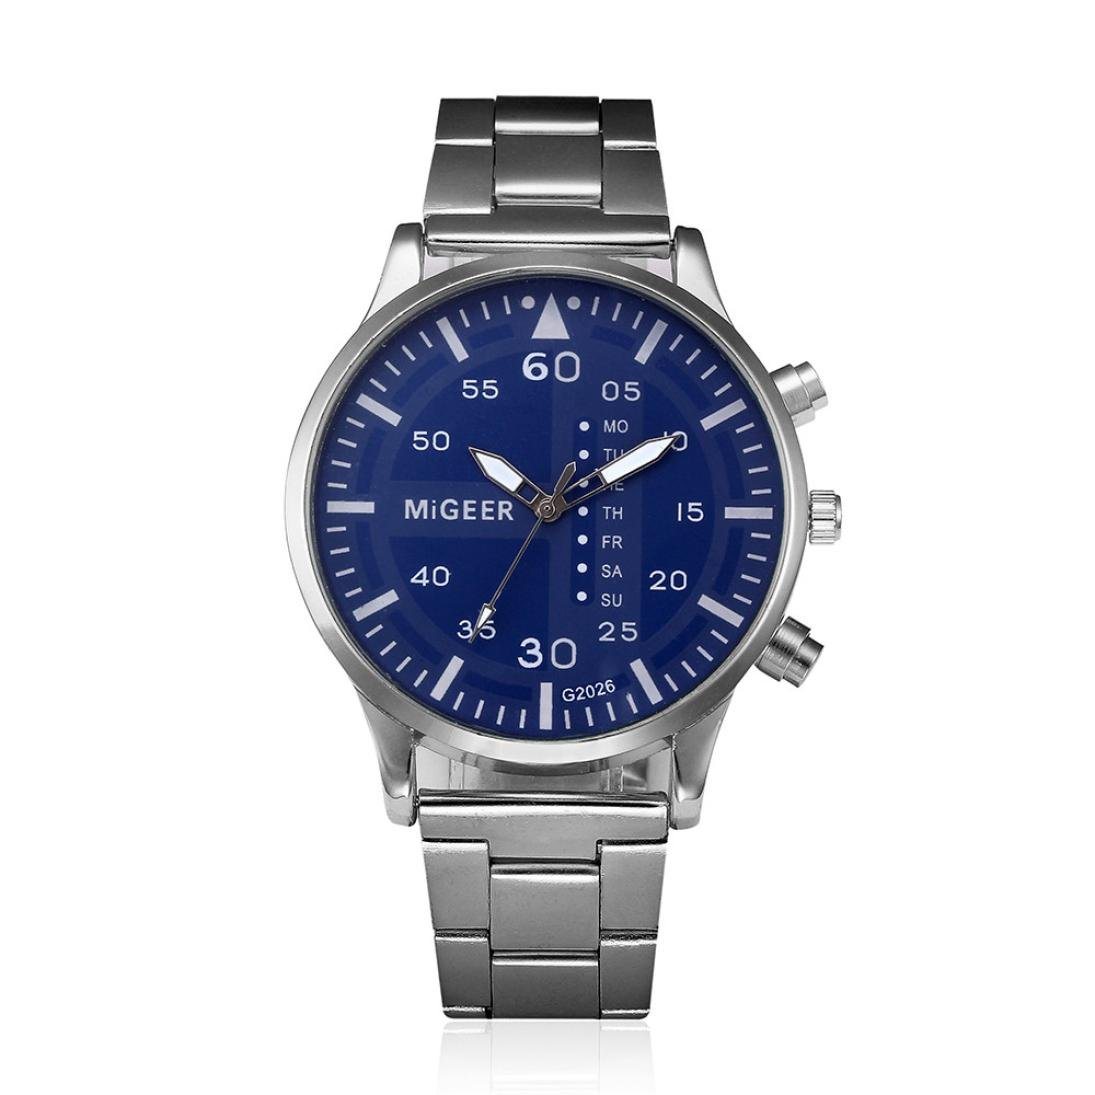 Amazon.com: Napoo Fashion Men Crystal Stainless Steel Analog Quartz Wrist Watch with Black Face Bracelet (Black): Watches